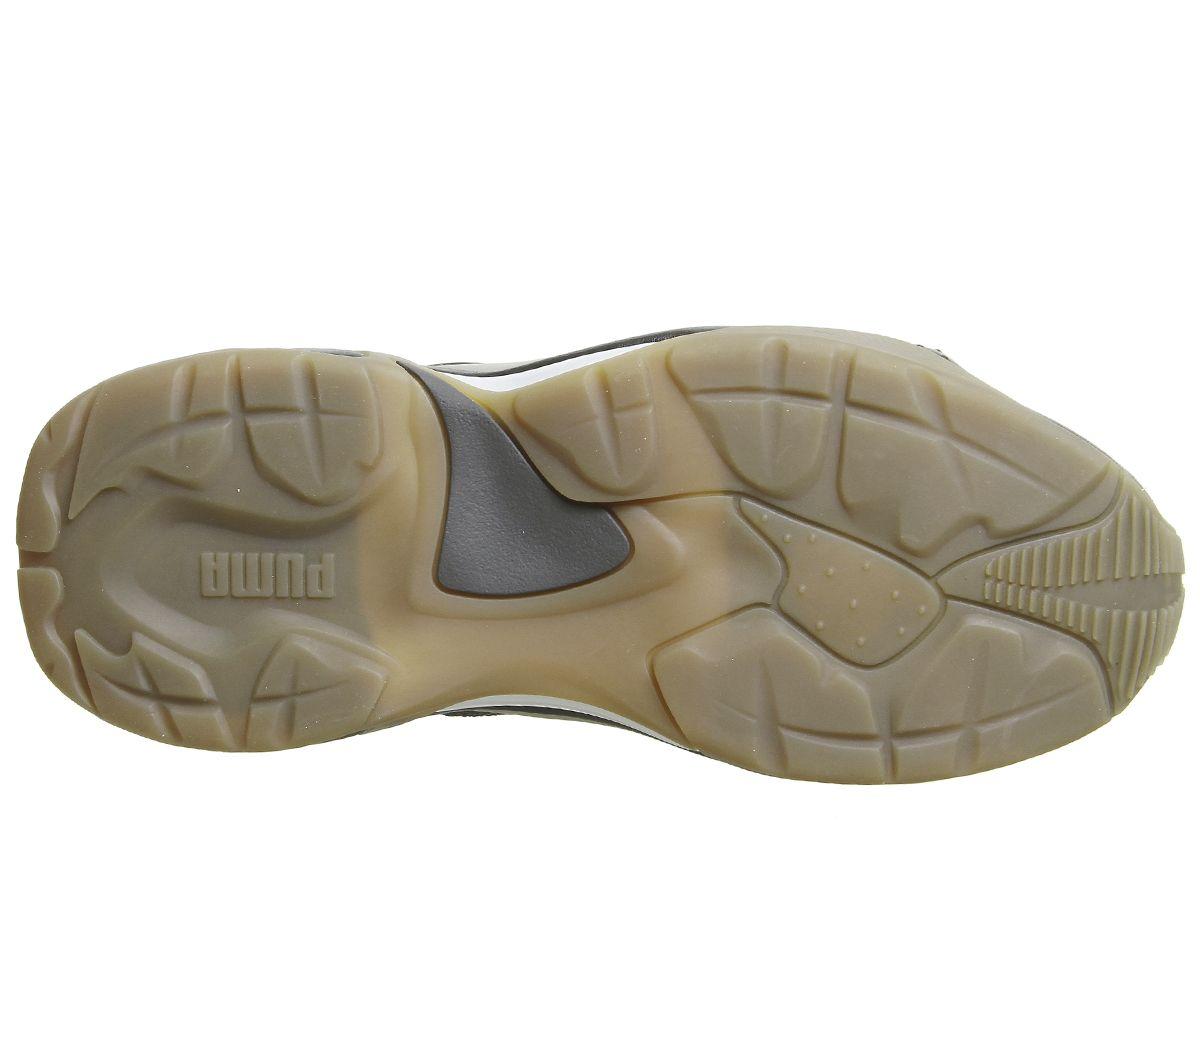 Mens-Puma-Thunder-Spectra-Trainers-Black-Grey-Purple-Gum-Trainers-Shoes thumbnail 12